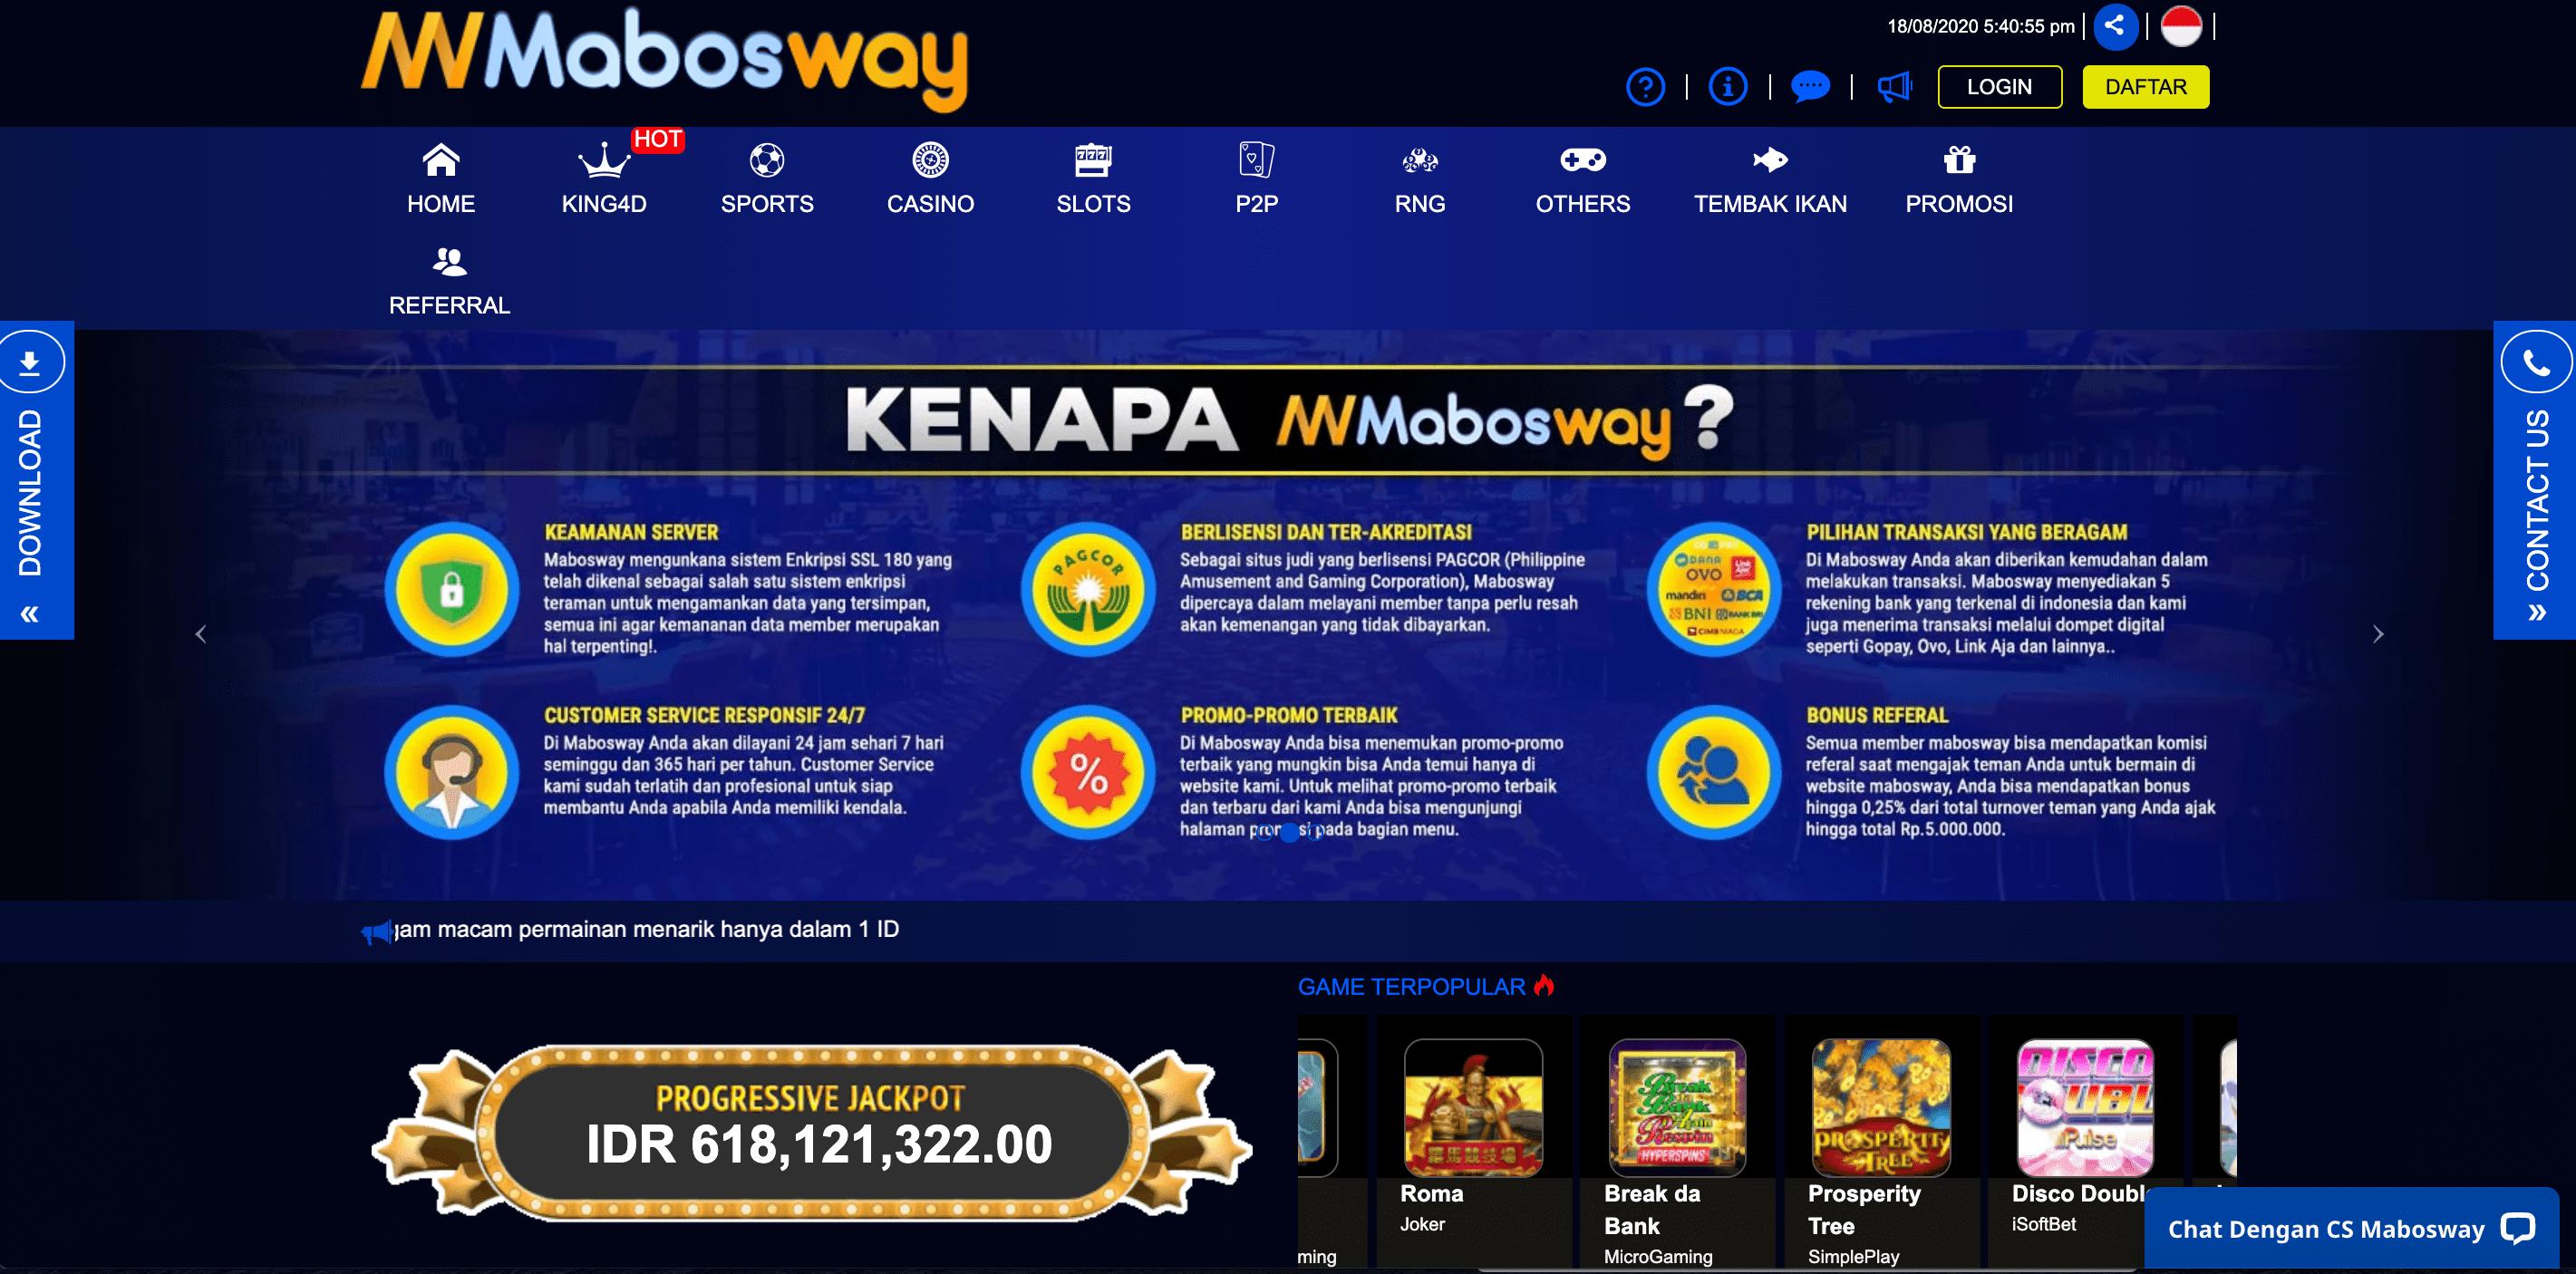 Situs Judi Online Poker Online Casino Online Terbaik Maboway Info